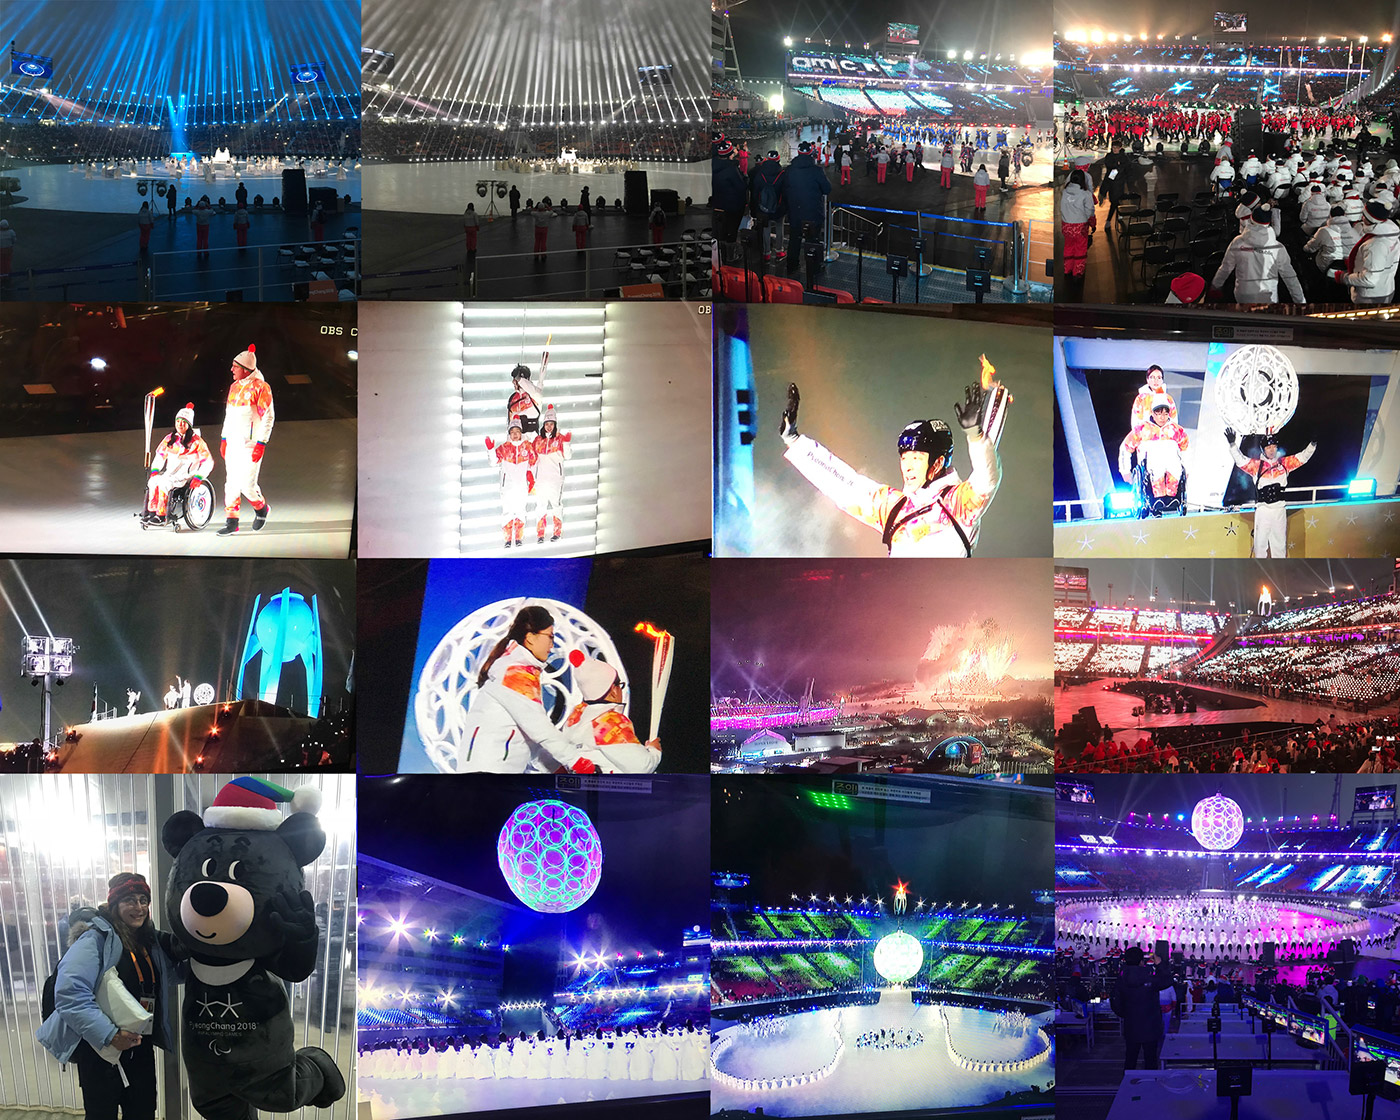 PyeongChang Paralympics 2018 Photo Montage 3 - Opening Ceremony